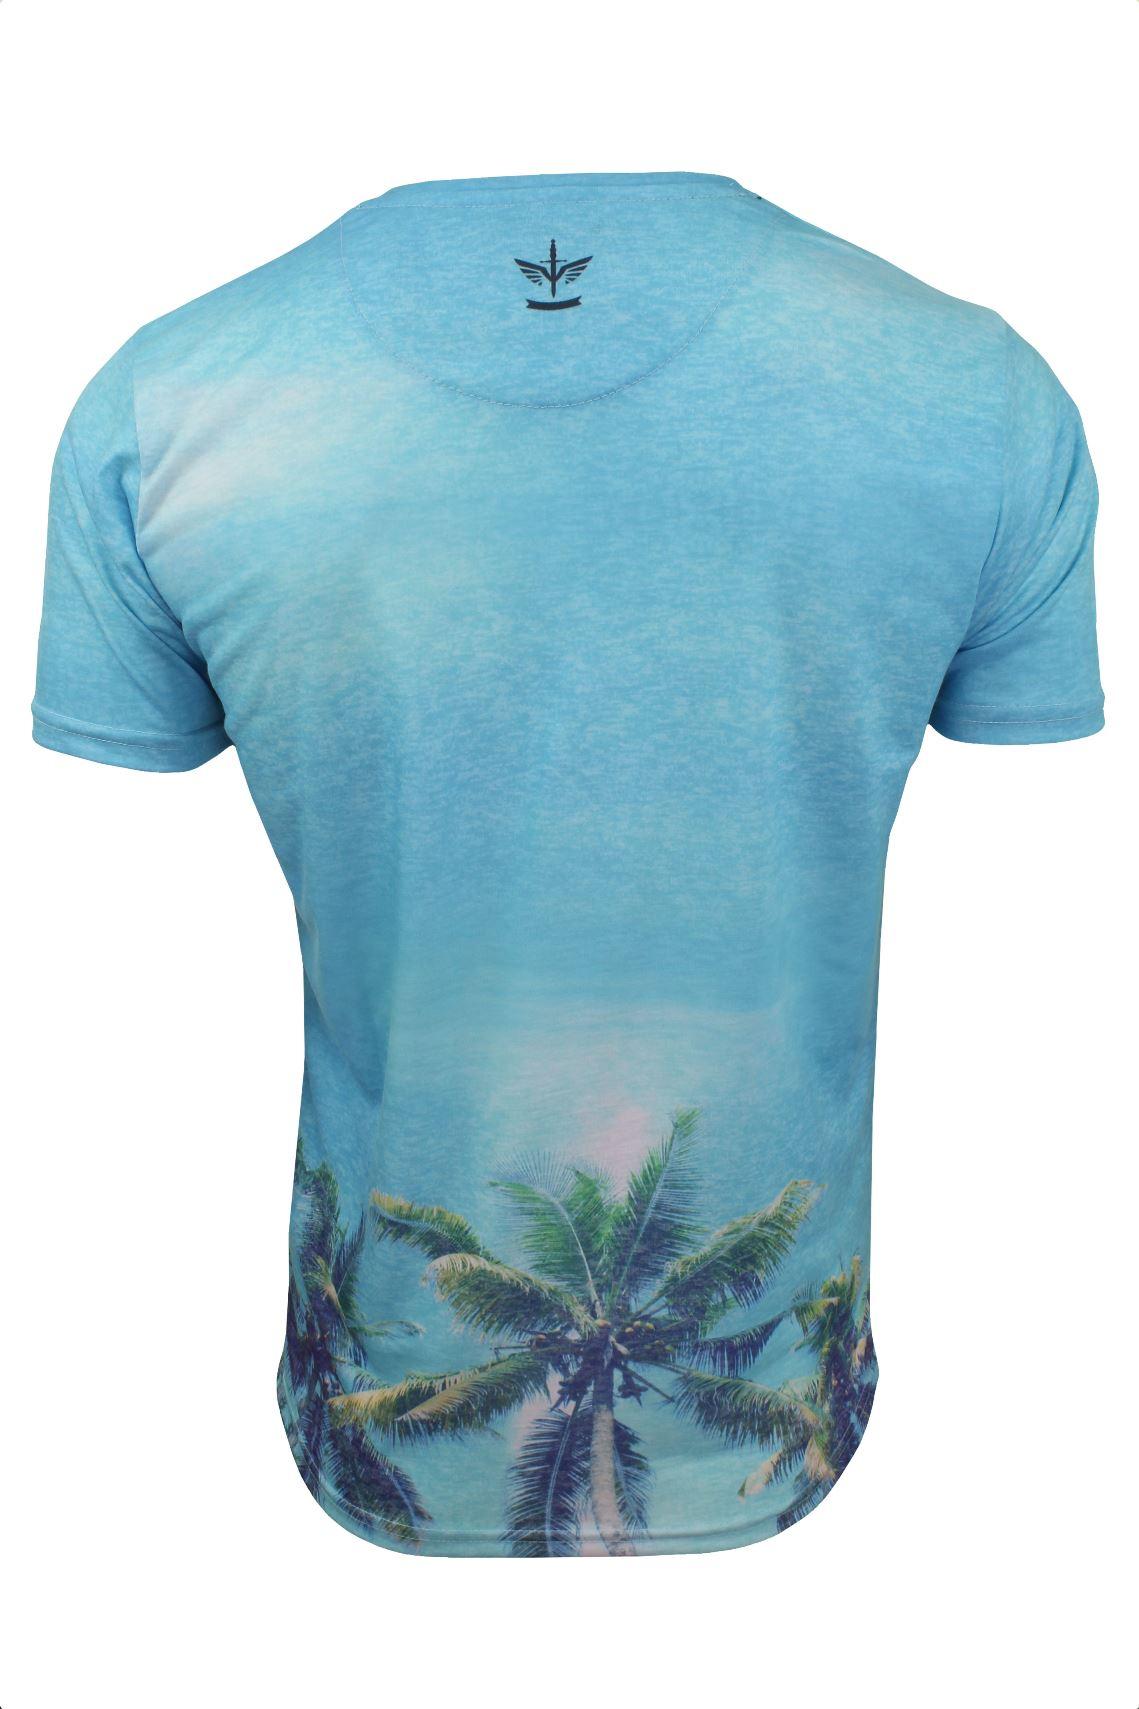 Mens T-Shirt by Firetrap /'Sunny Tee/' USA City Print